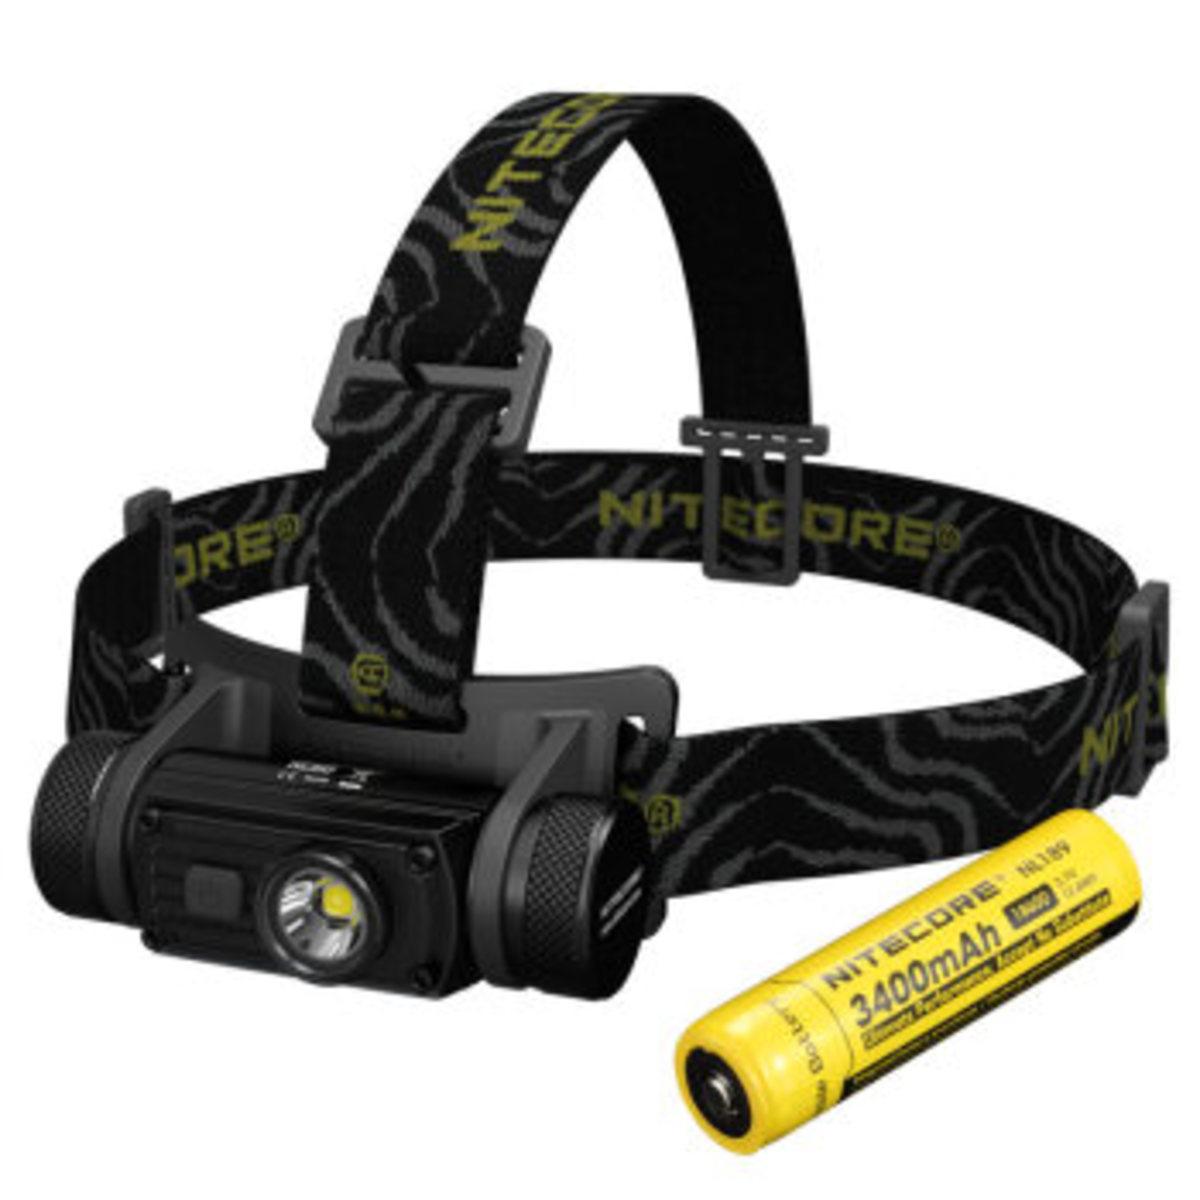 HC60 CW Headlamp Set NL189 18650 Battery USB Rechargeable HK Warranty